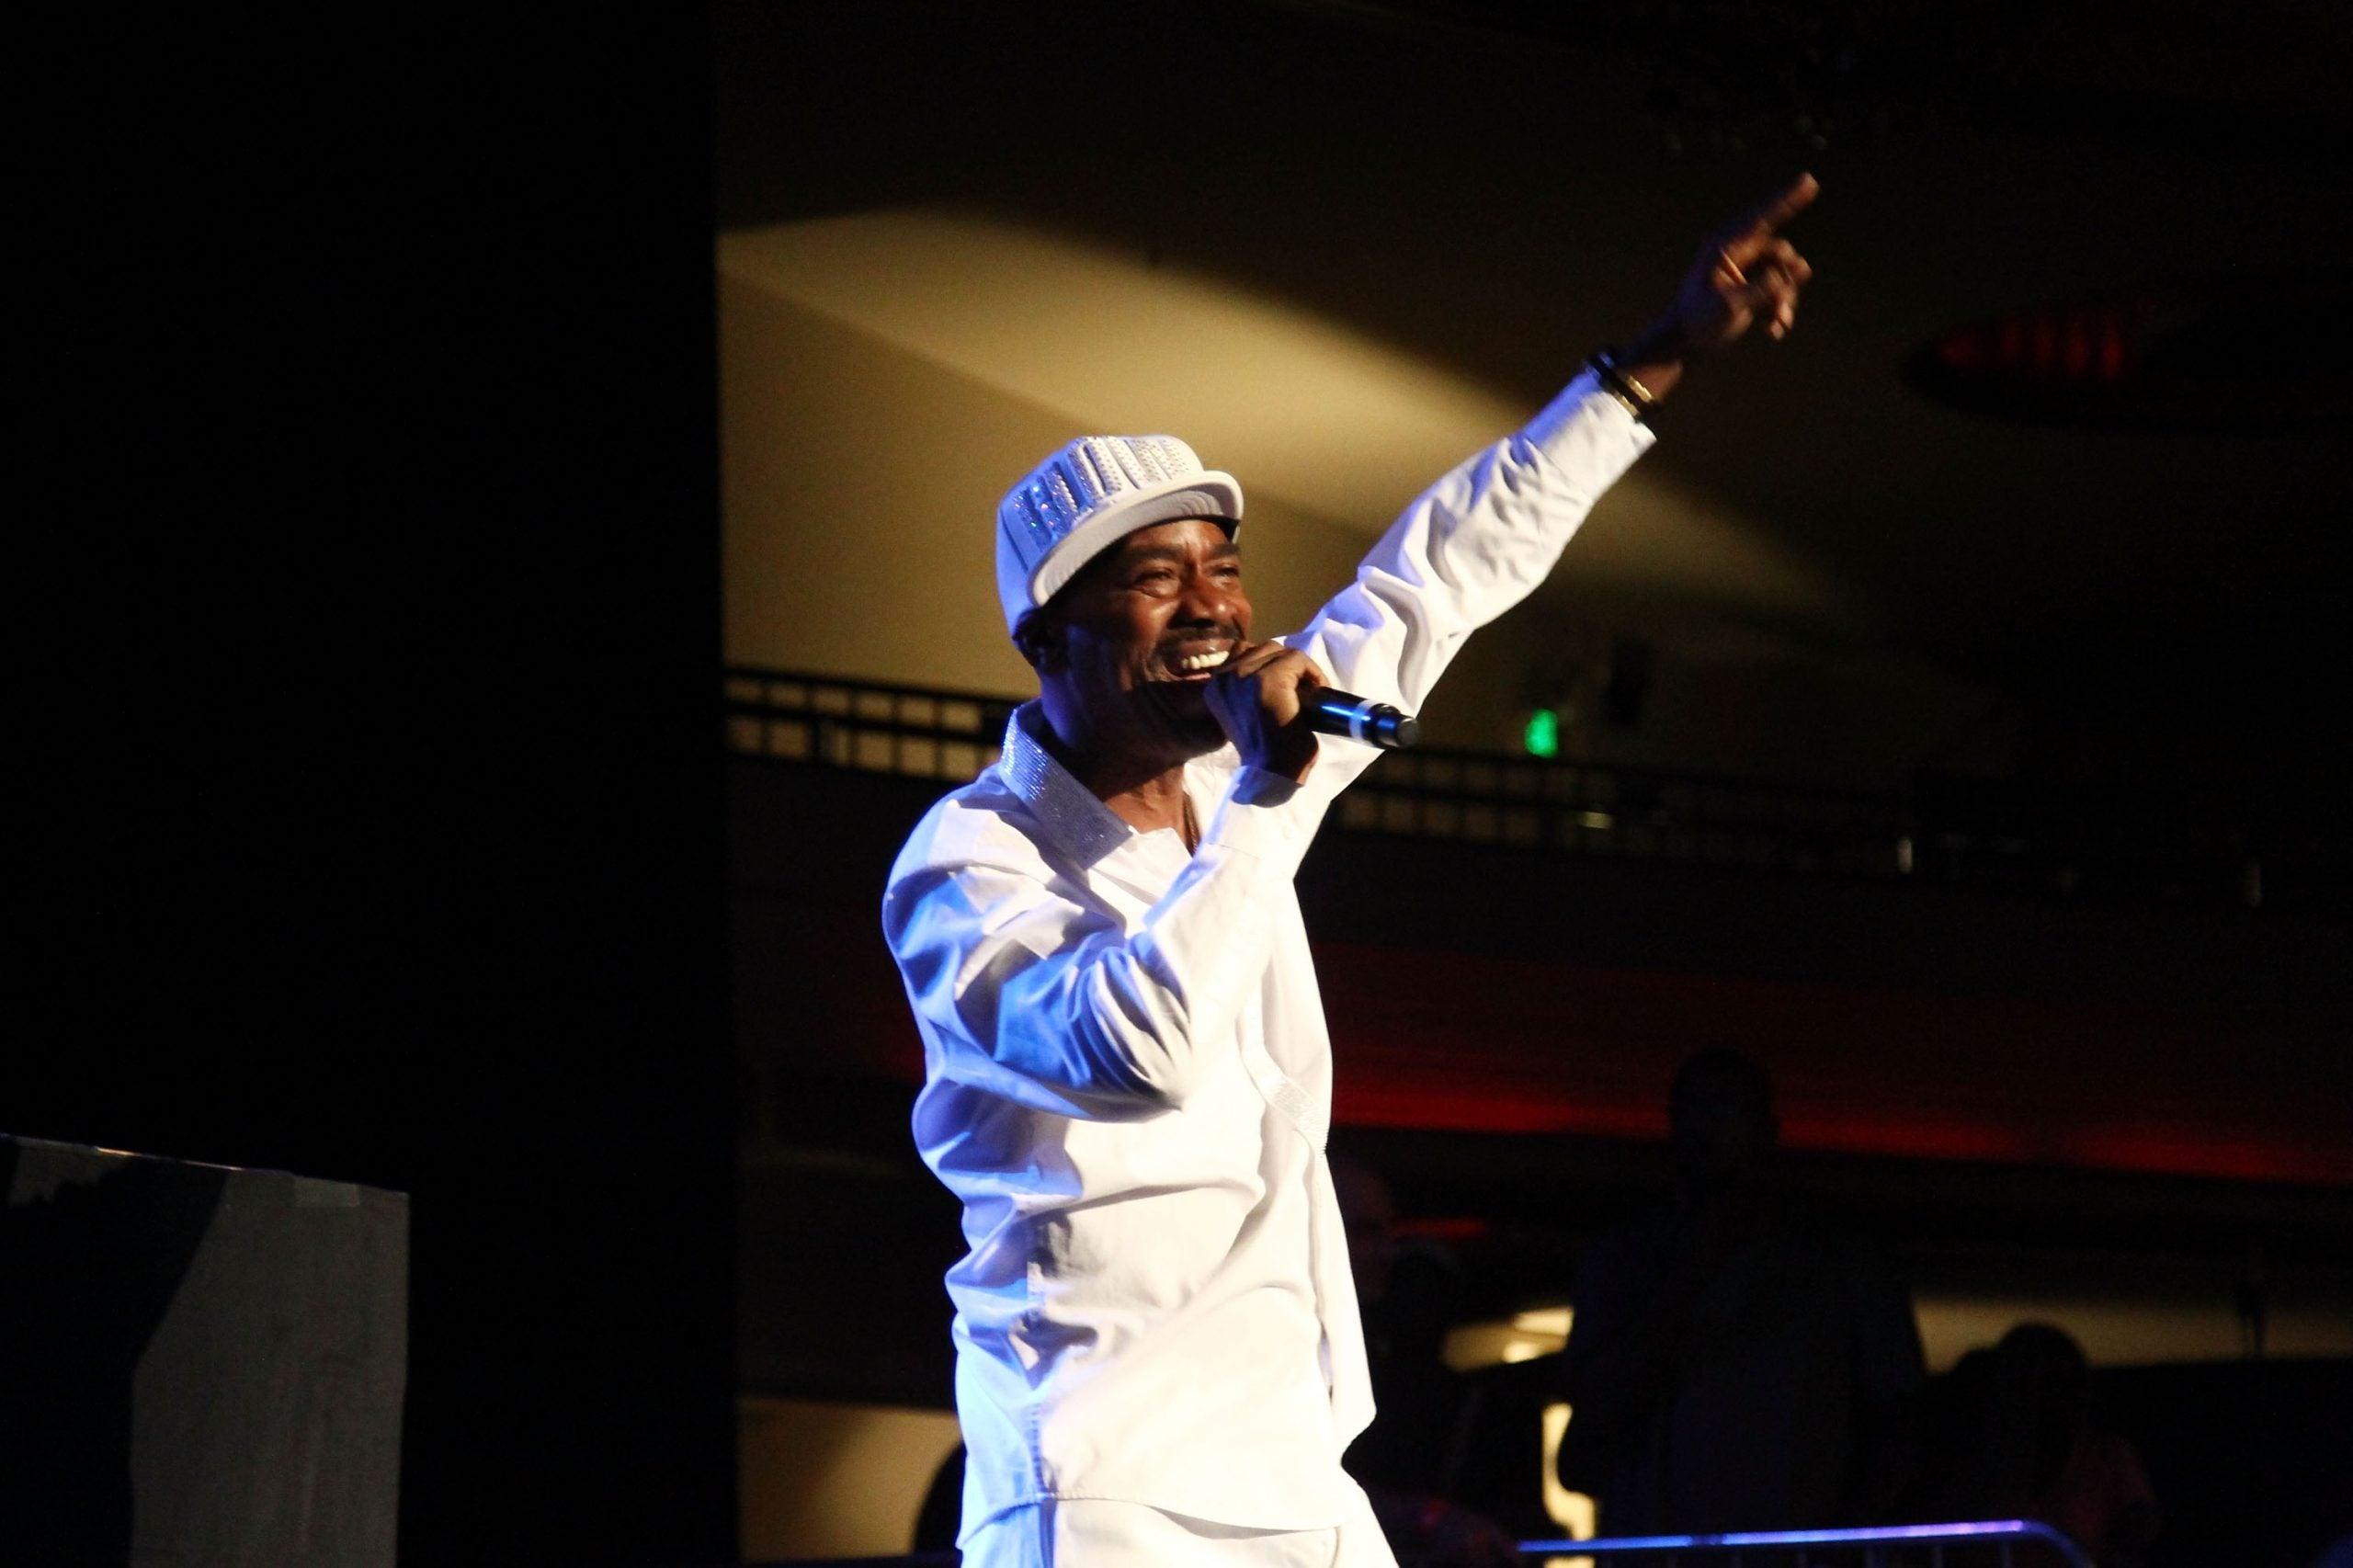 Rap Legend Kurtis Blow Underwent A Successful Heart Transplant